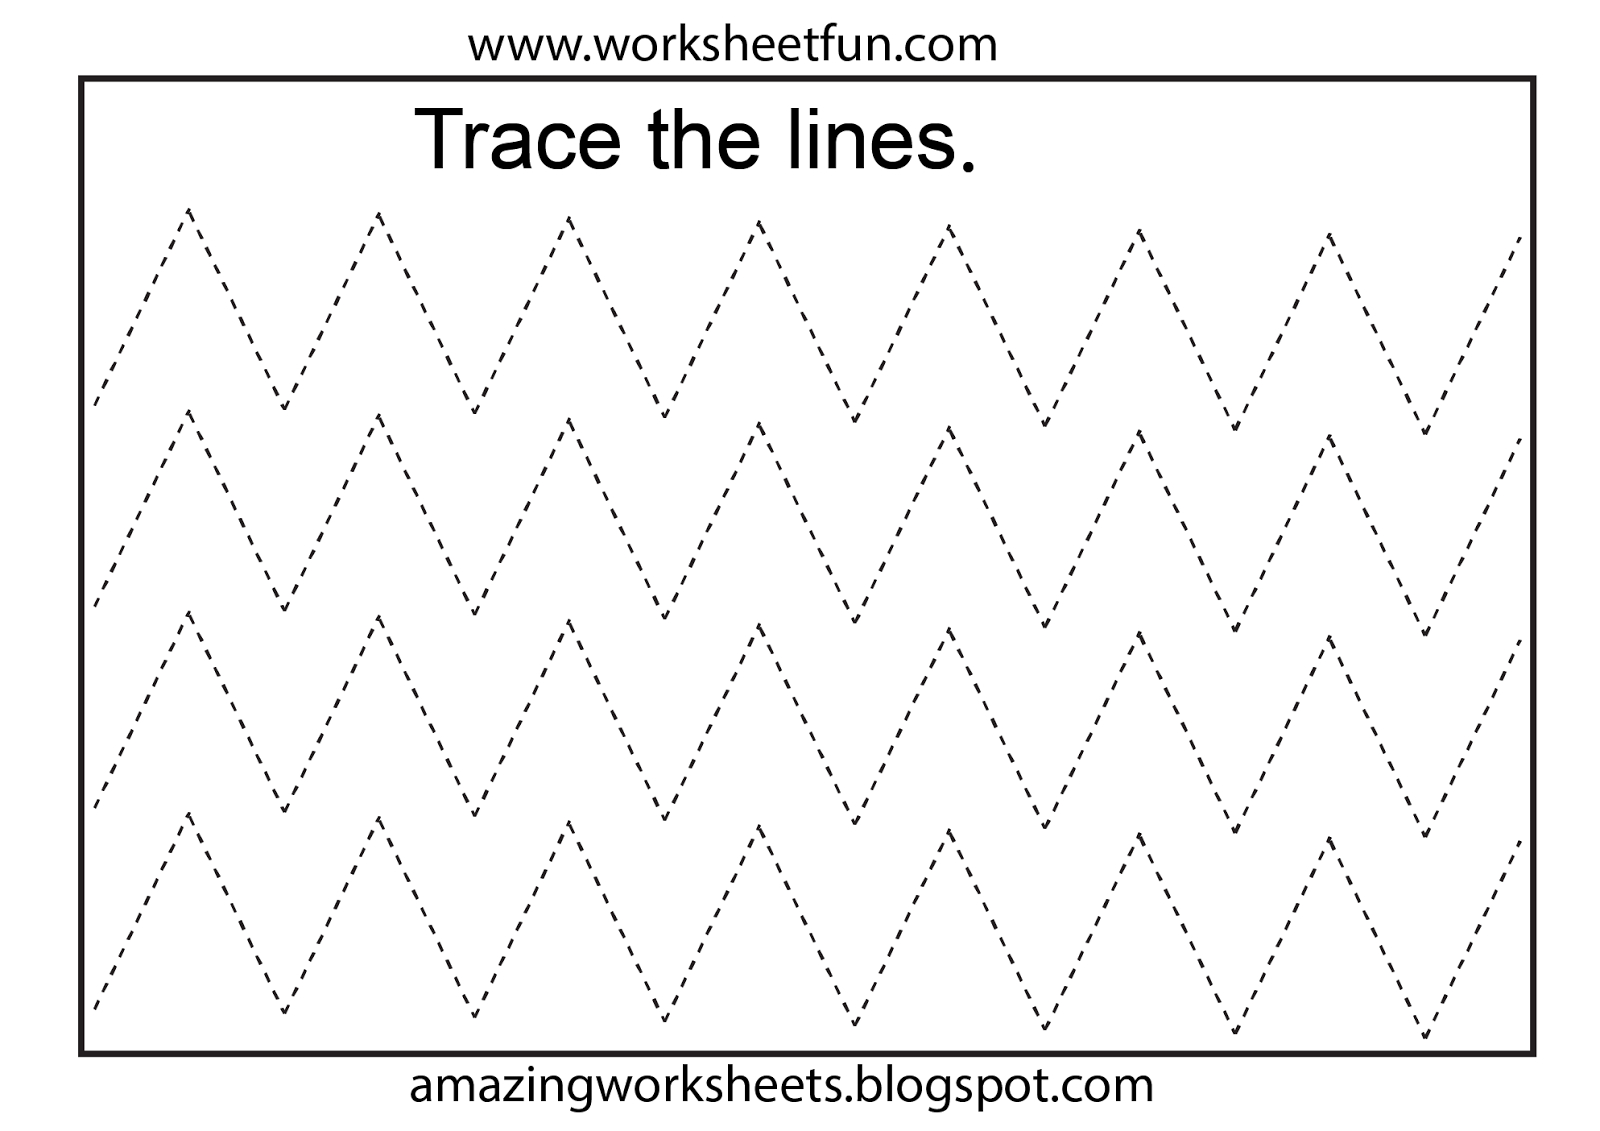 Free Printable Tracing Worksheets Preschool | Preschool Worksheets | Free Printable Cutting Worksheets For Kindergarten